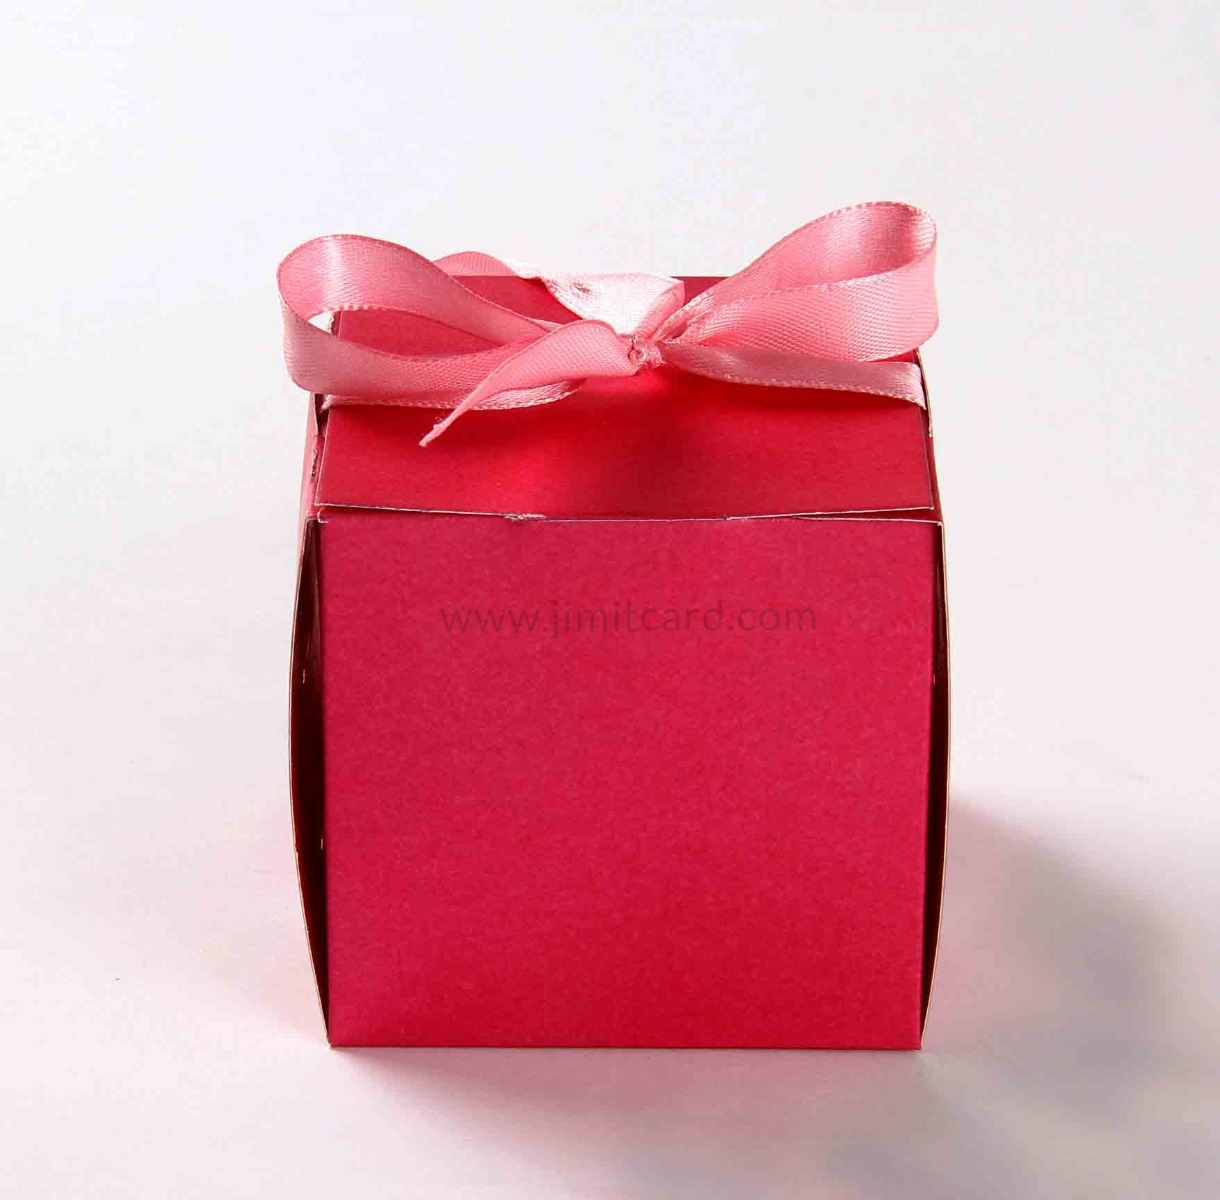 Bow Top Cube Favor Box No 5 - Pink-8549